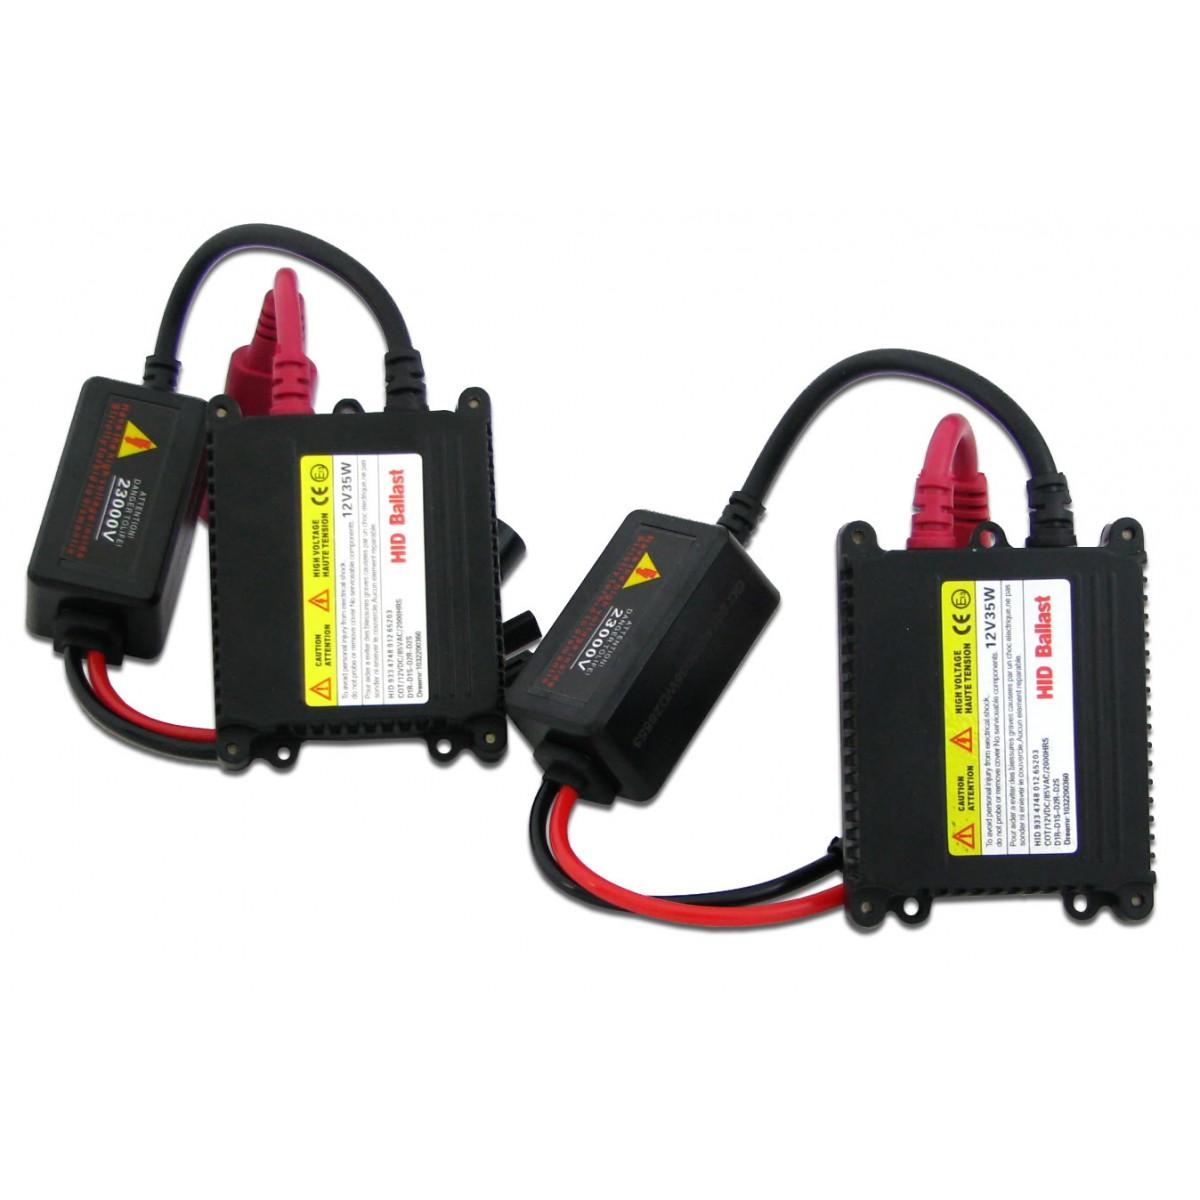 Kit Farol de Milha Neblina Mitsubishi L200 Triton 2011 2012 - Interruptor Modelo Original + Kit Xenon H11 Com Reator Digital -  6000K ou 8000K